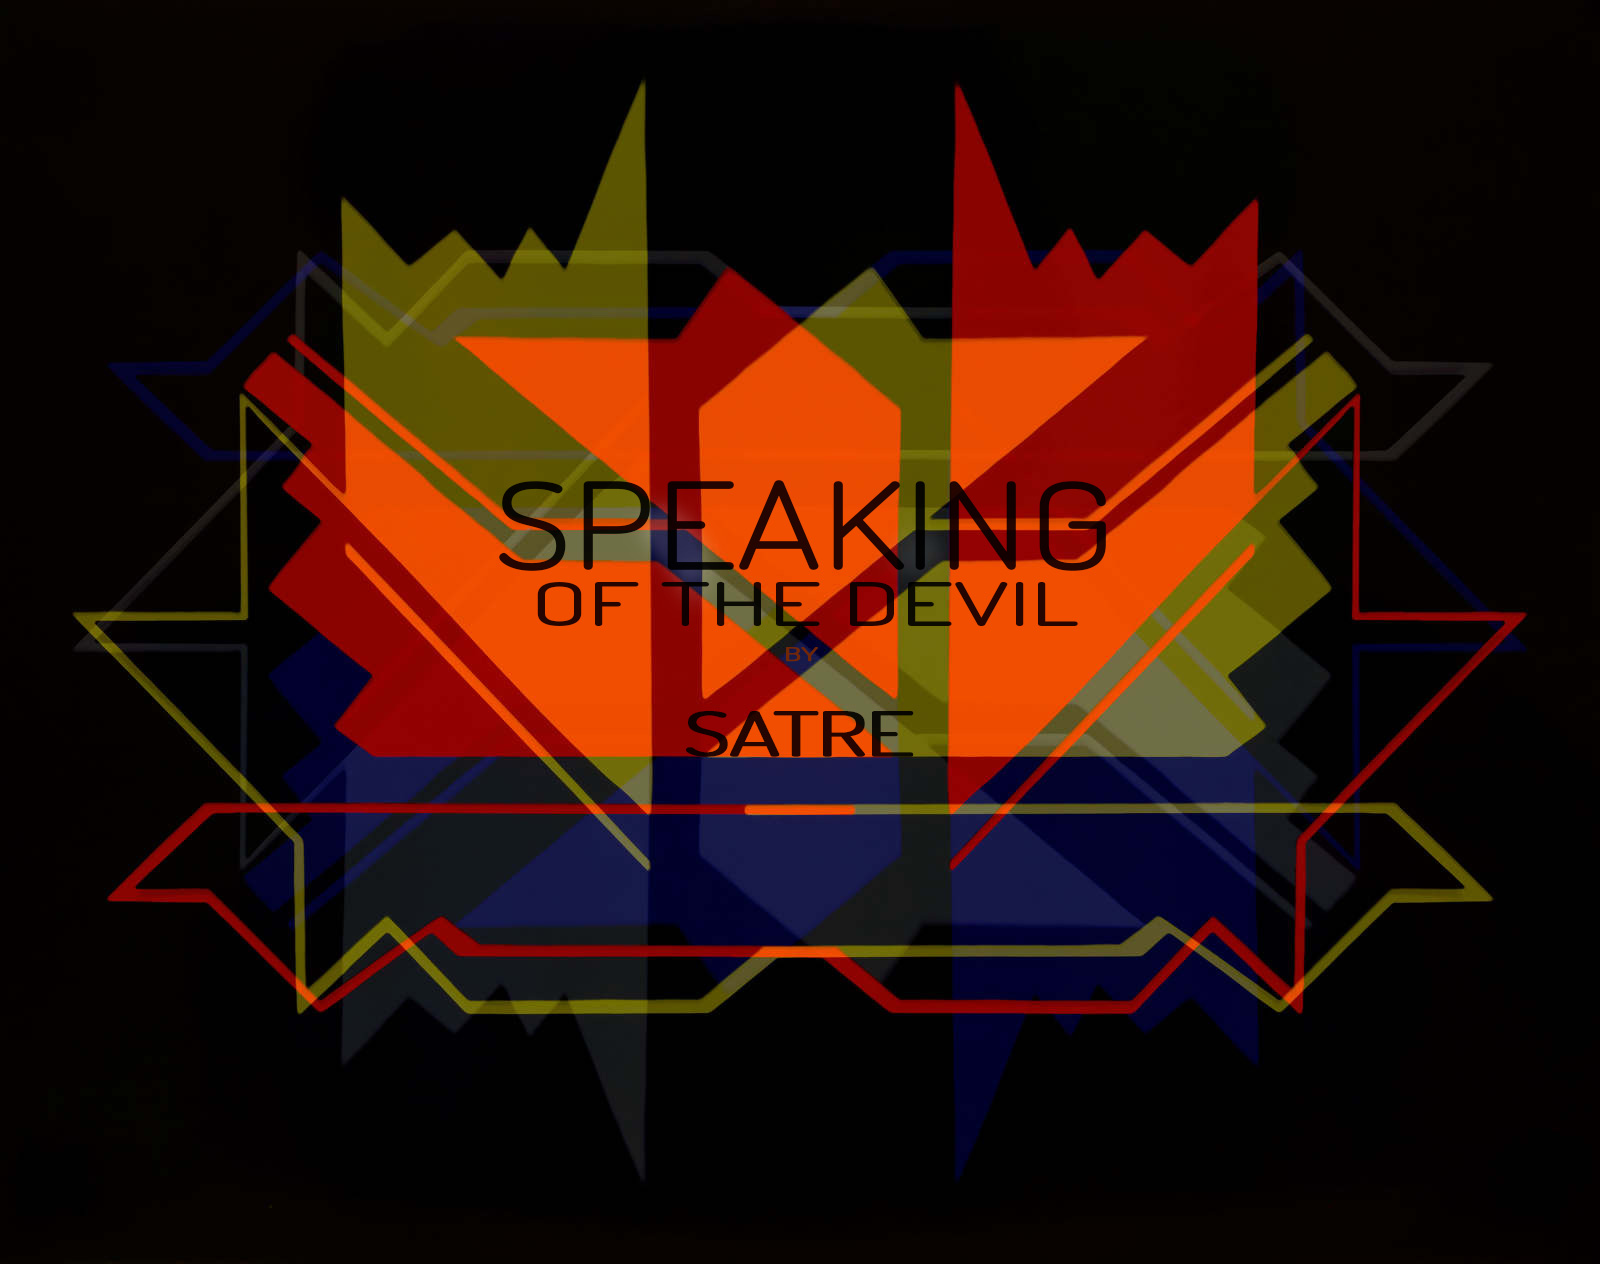 Speaking-Of-The-Devil-front-1500-geir-satre.jpg